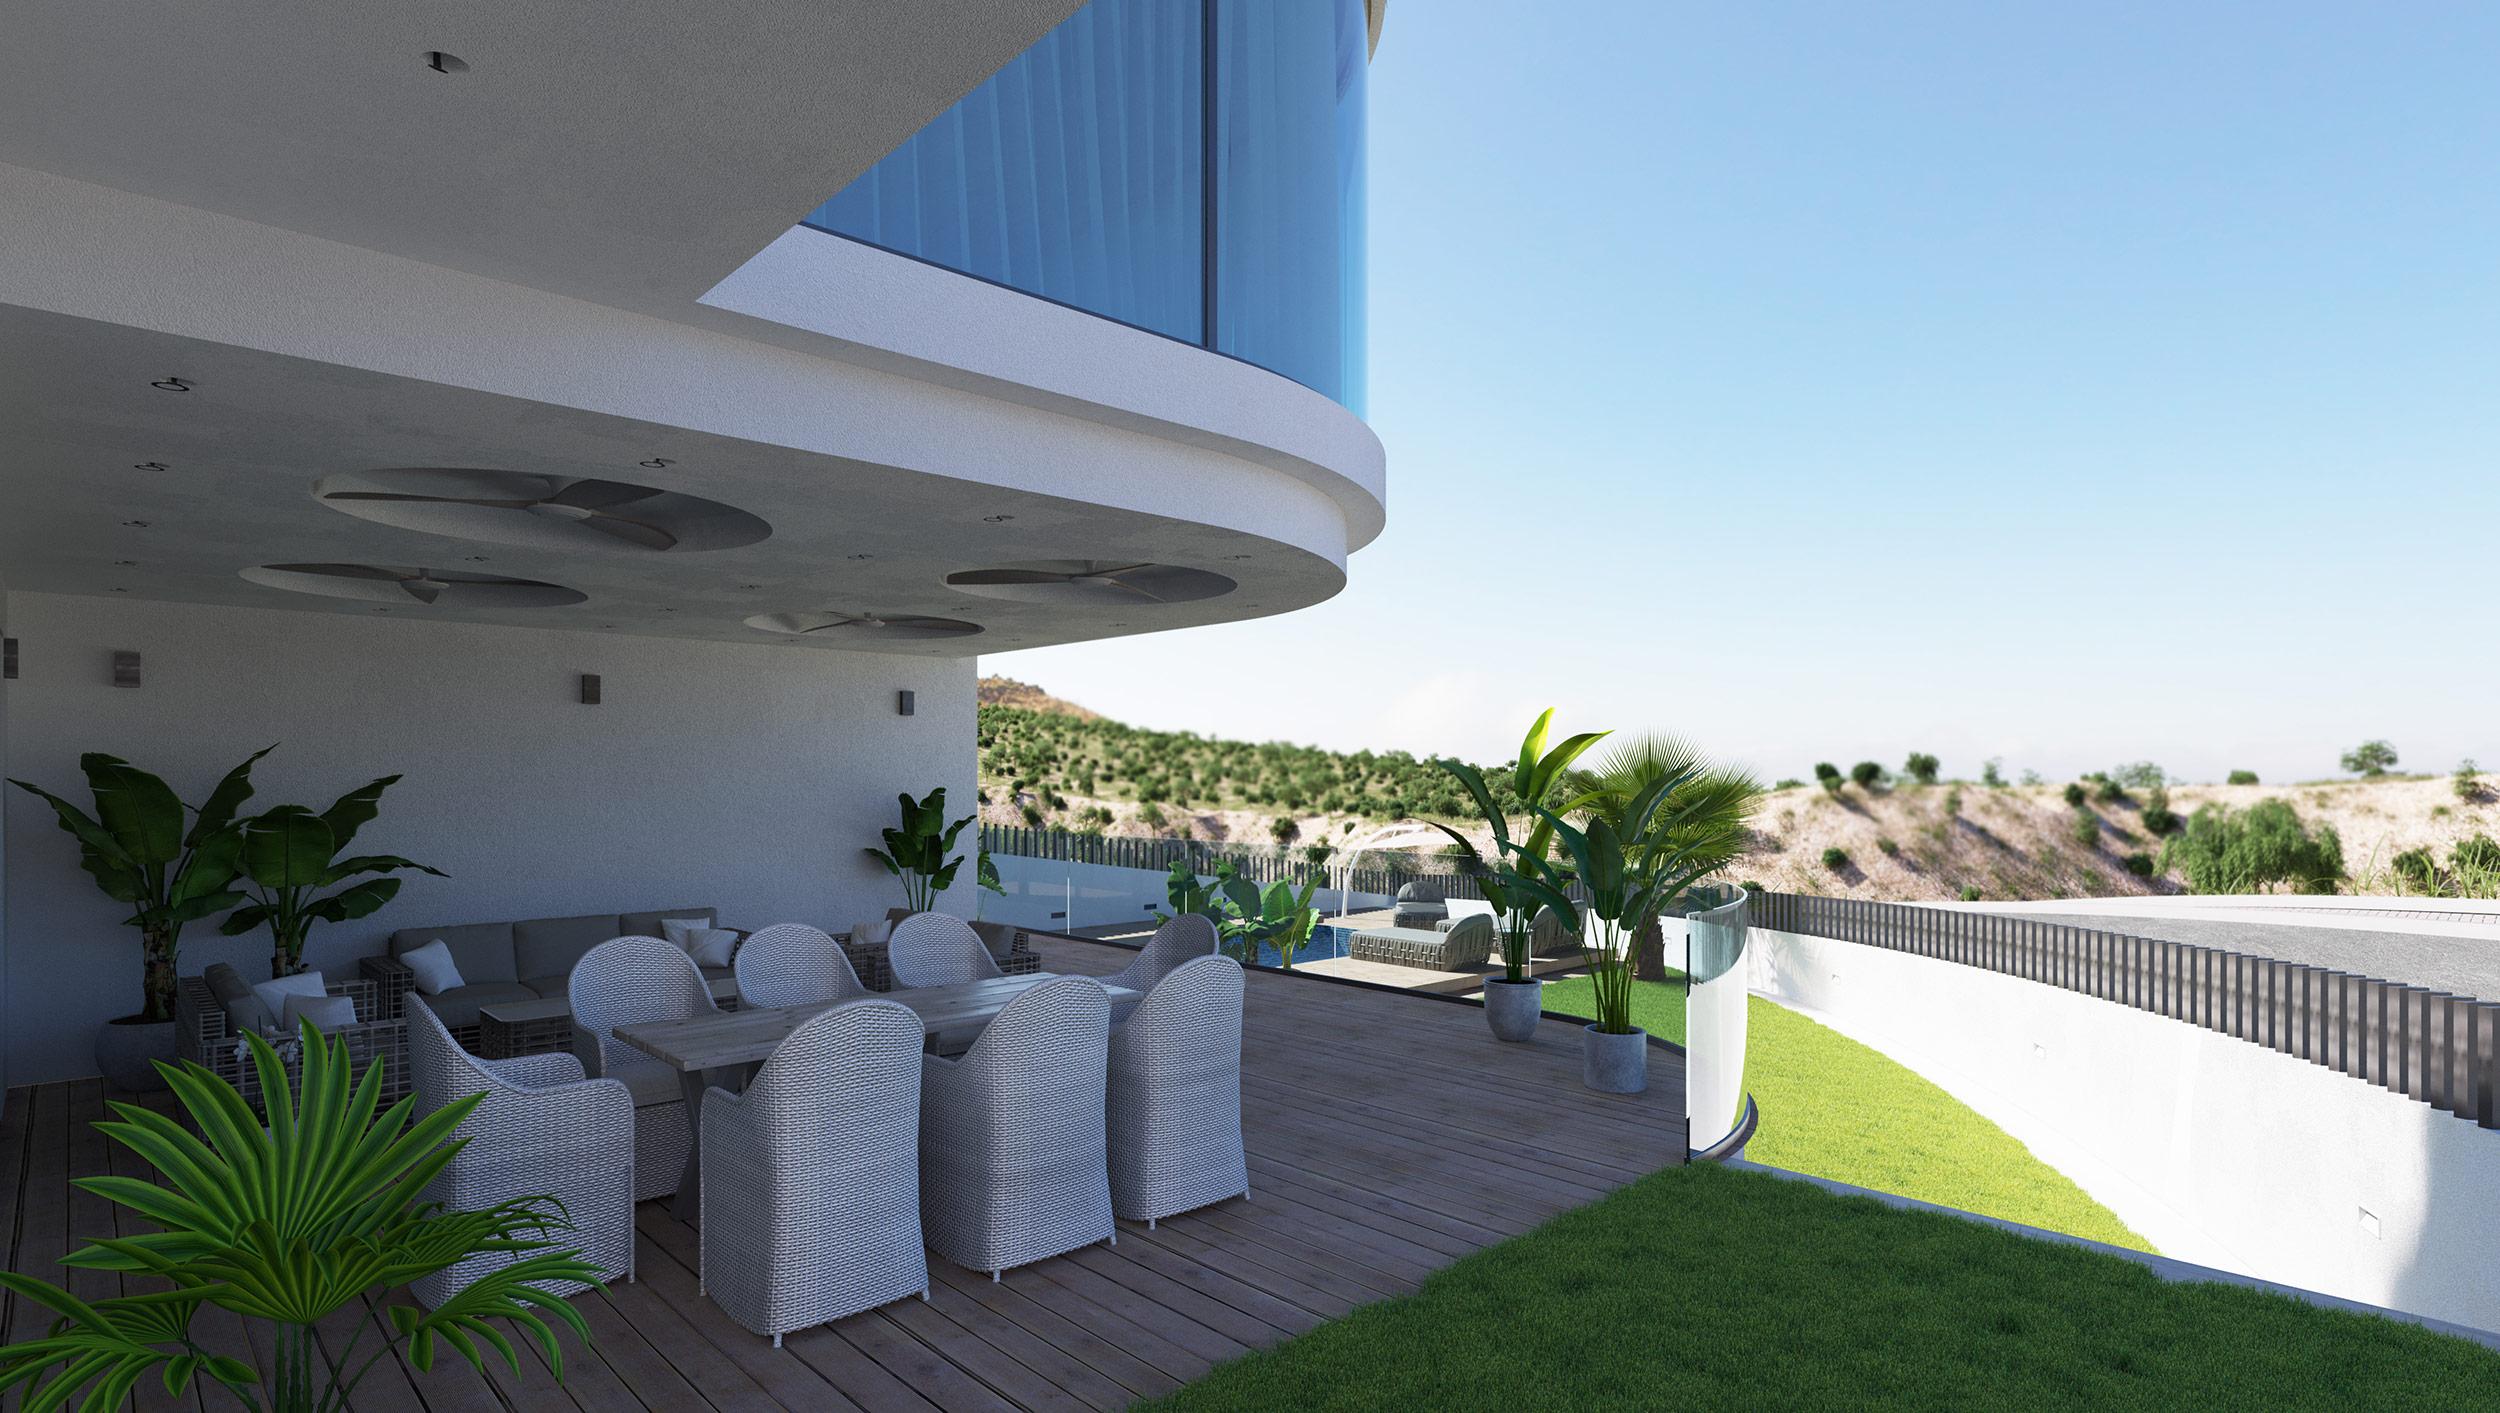 https://www.atelierzoz.com/wp-content/uploads/2020/12/atelierzoz-meadowview-villa-5.jpg